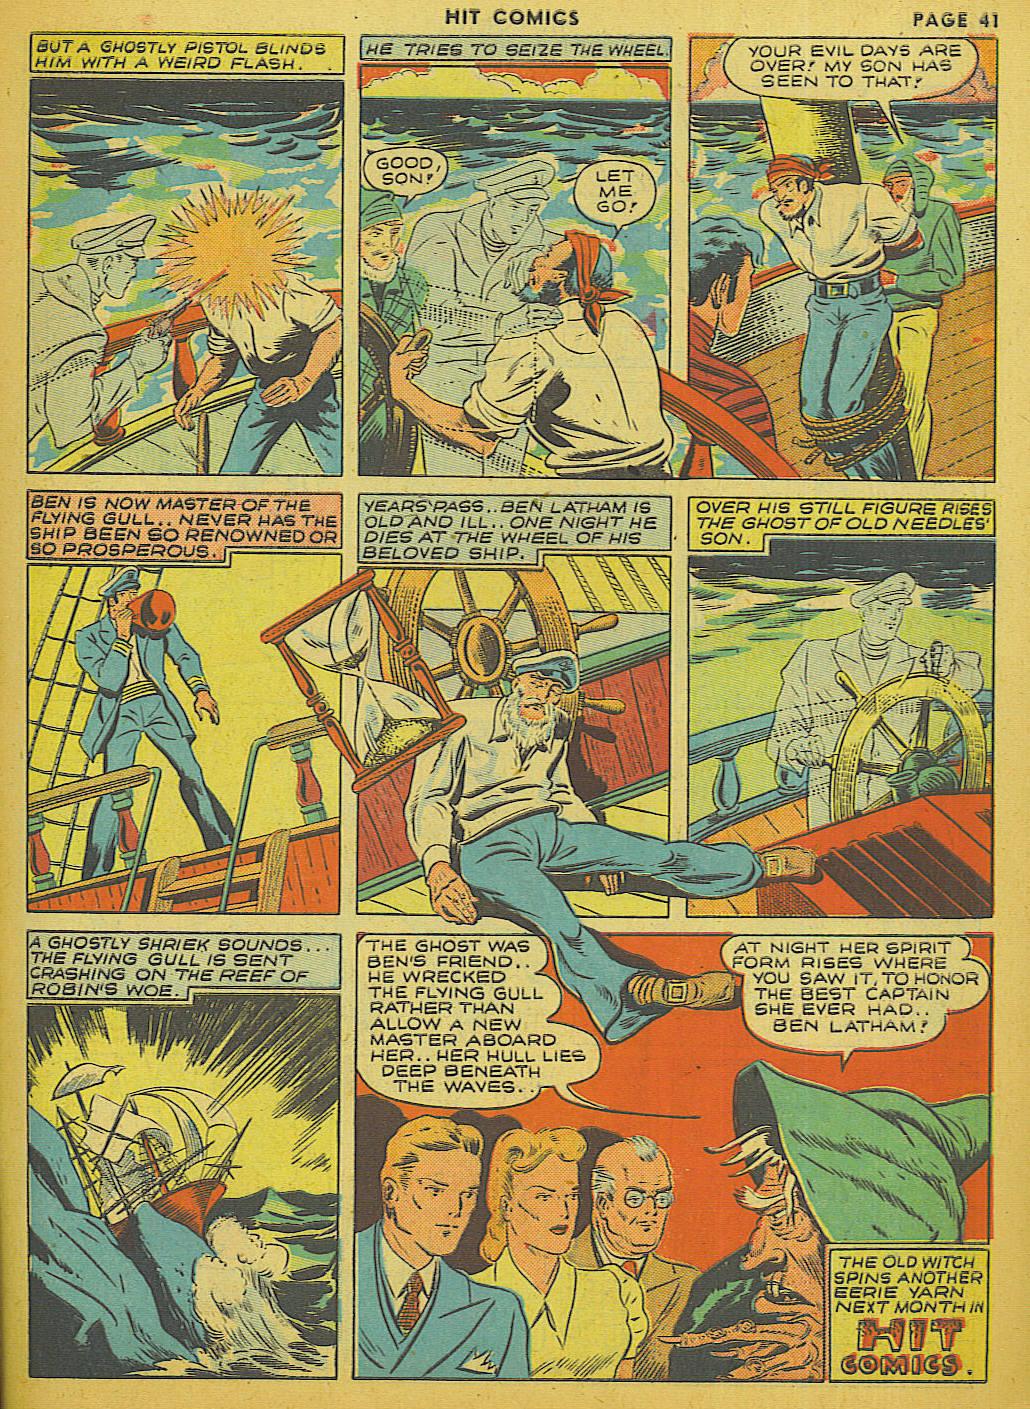 Read online Hit Comics comic -  Issue #13 - 43